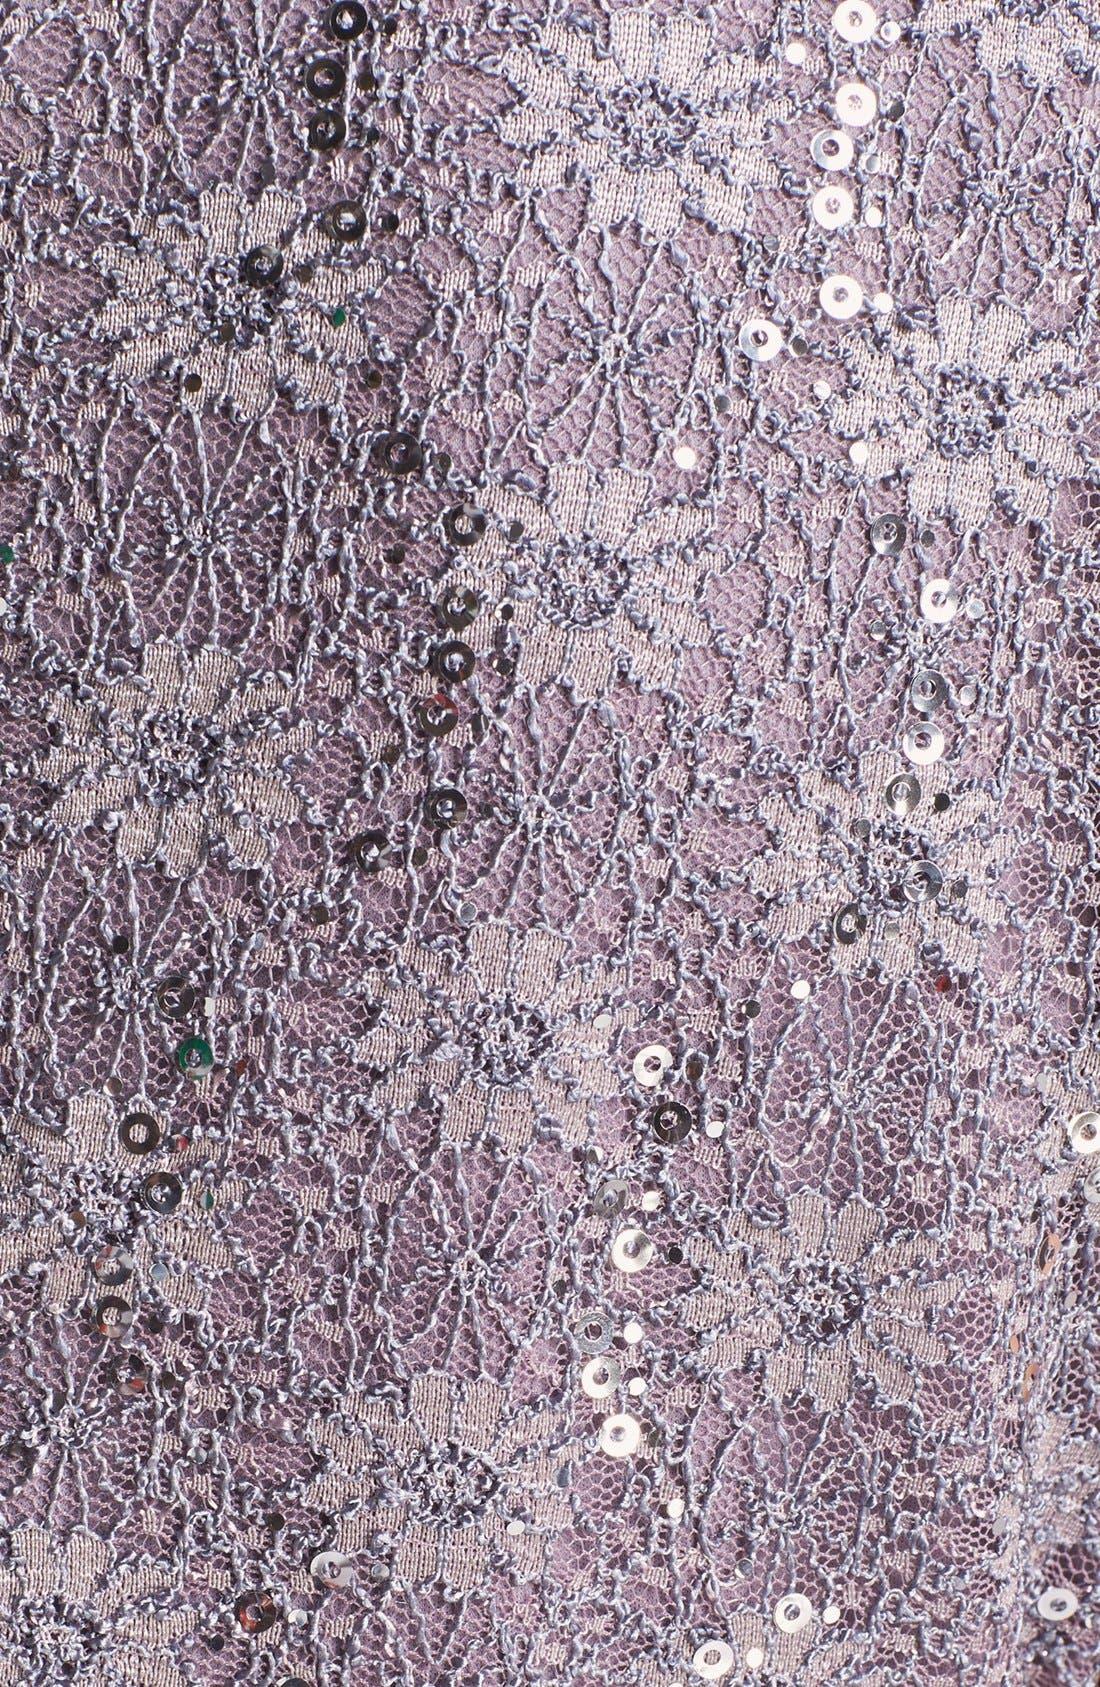 Sequin Lace Overlay Sheath Dress,                             Alternate thumbnail 2, color,                             031